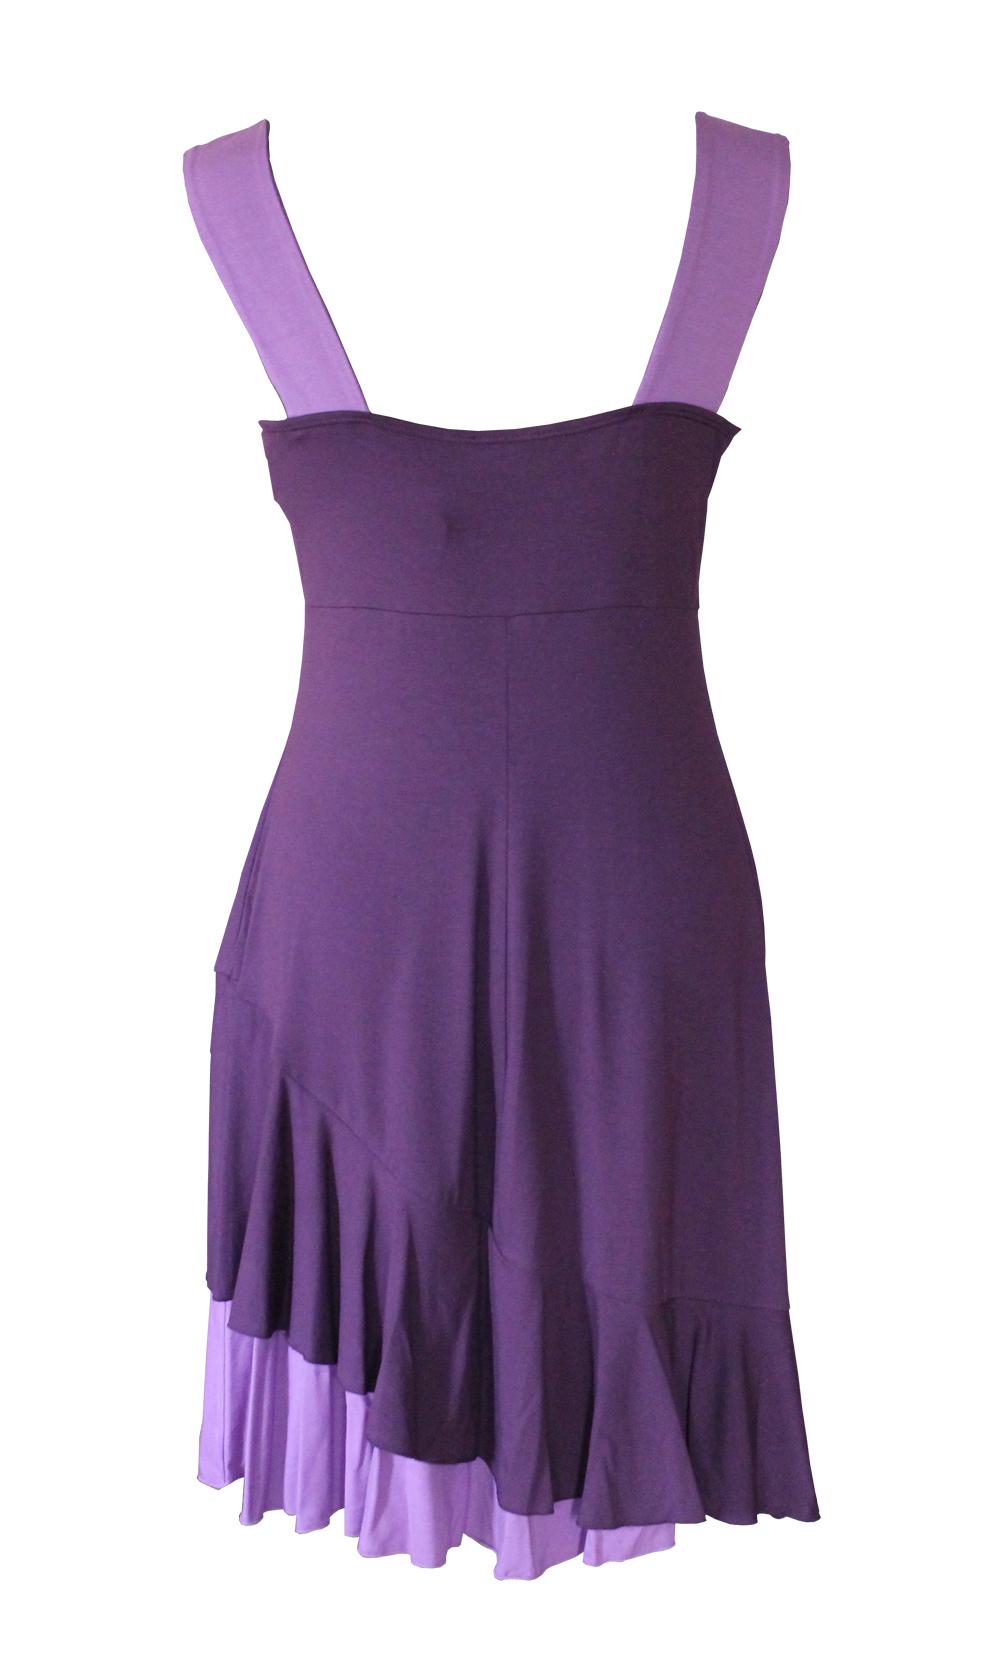 Luc Fontaine: Fabulous Falbala Dress (Almost Gone!)